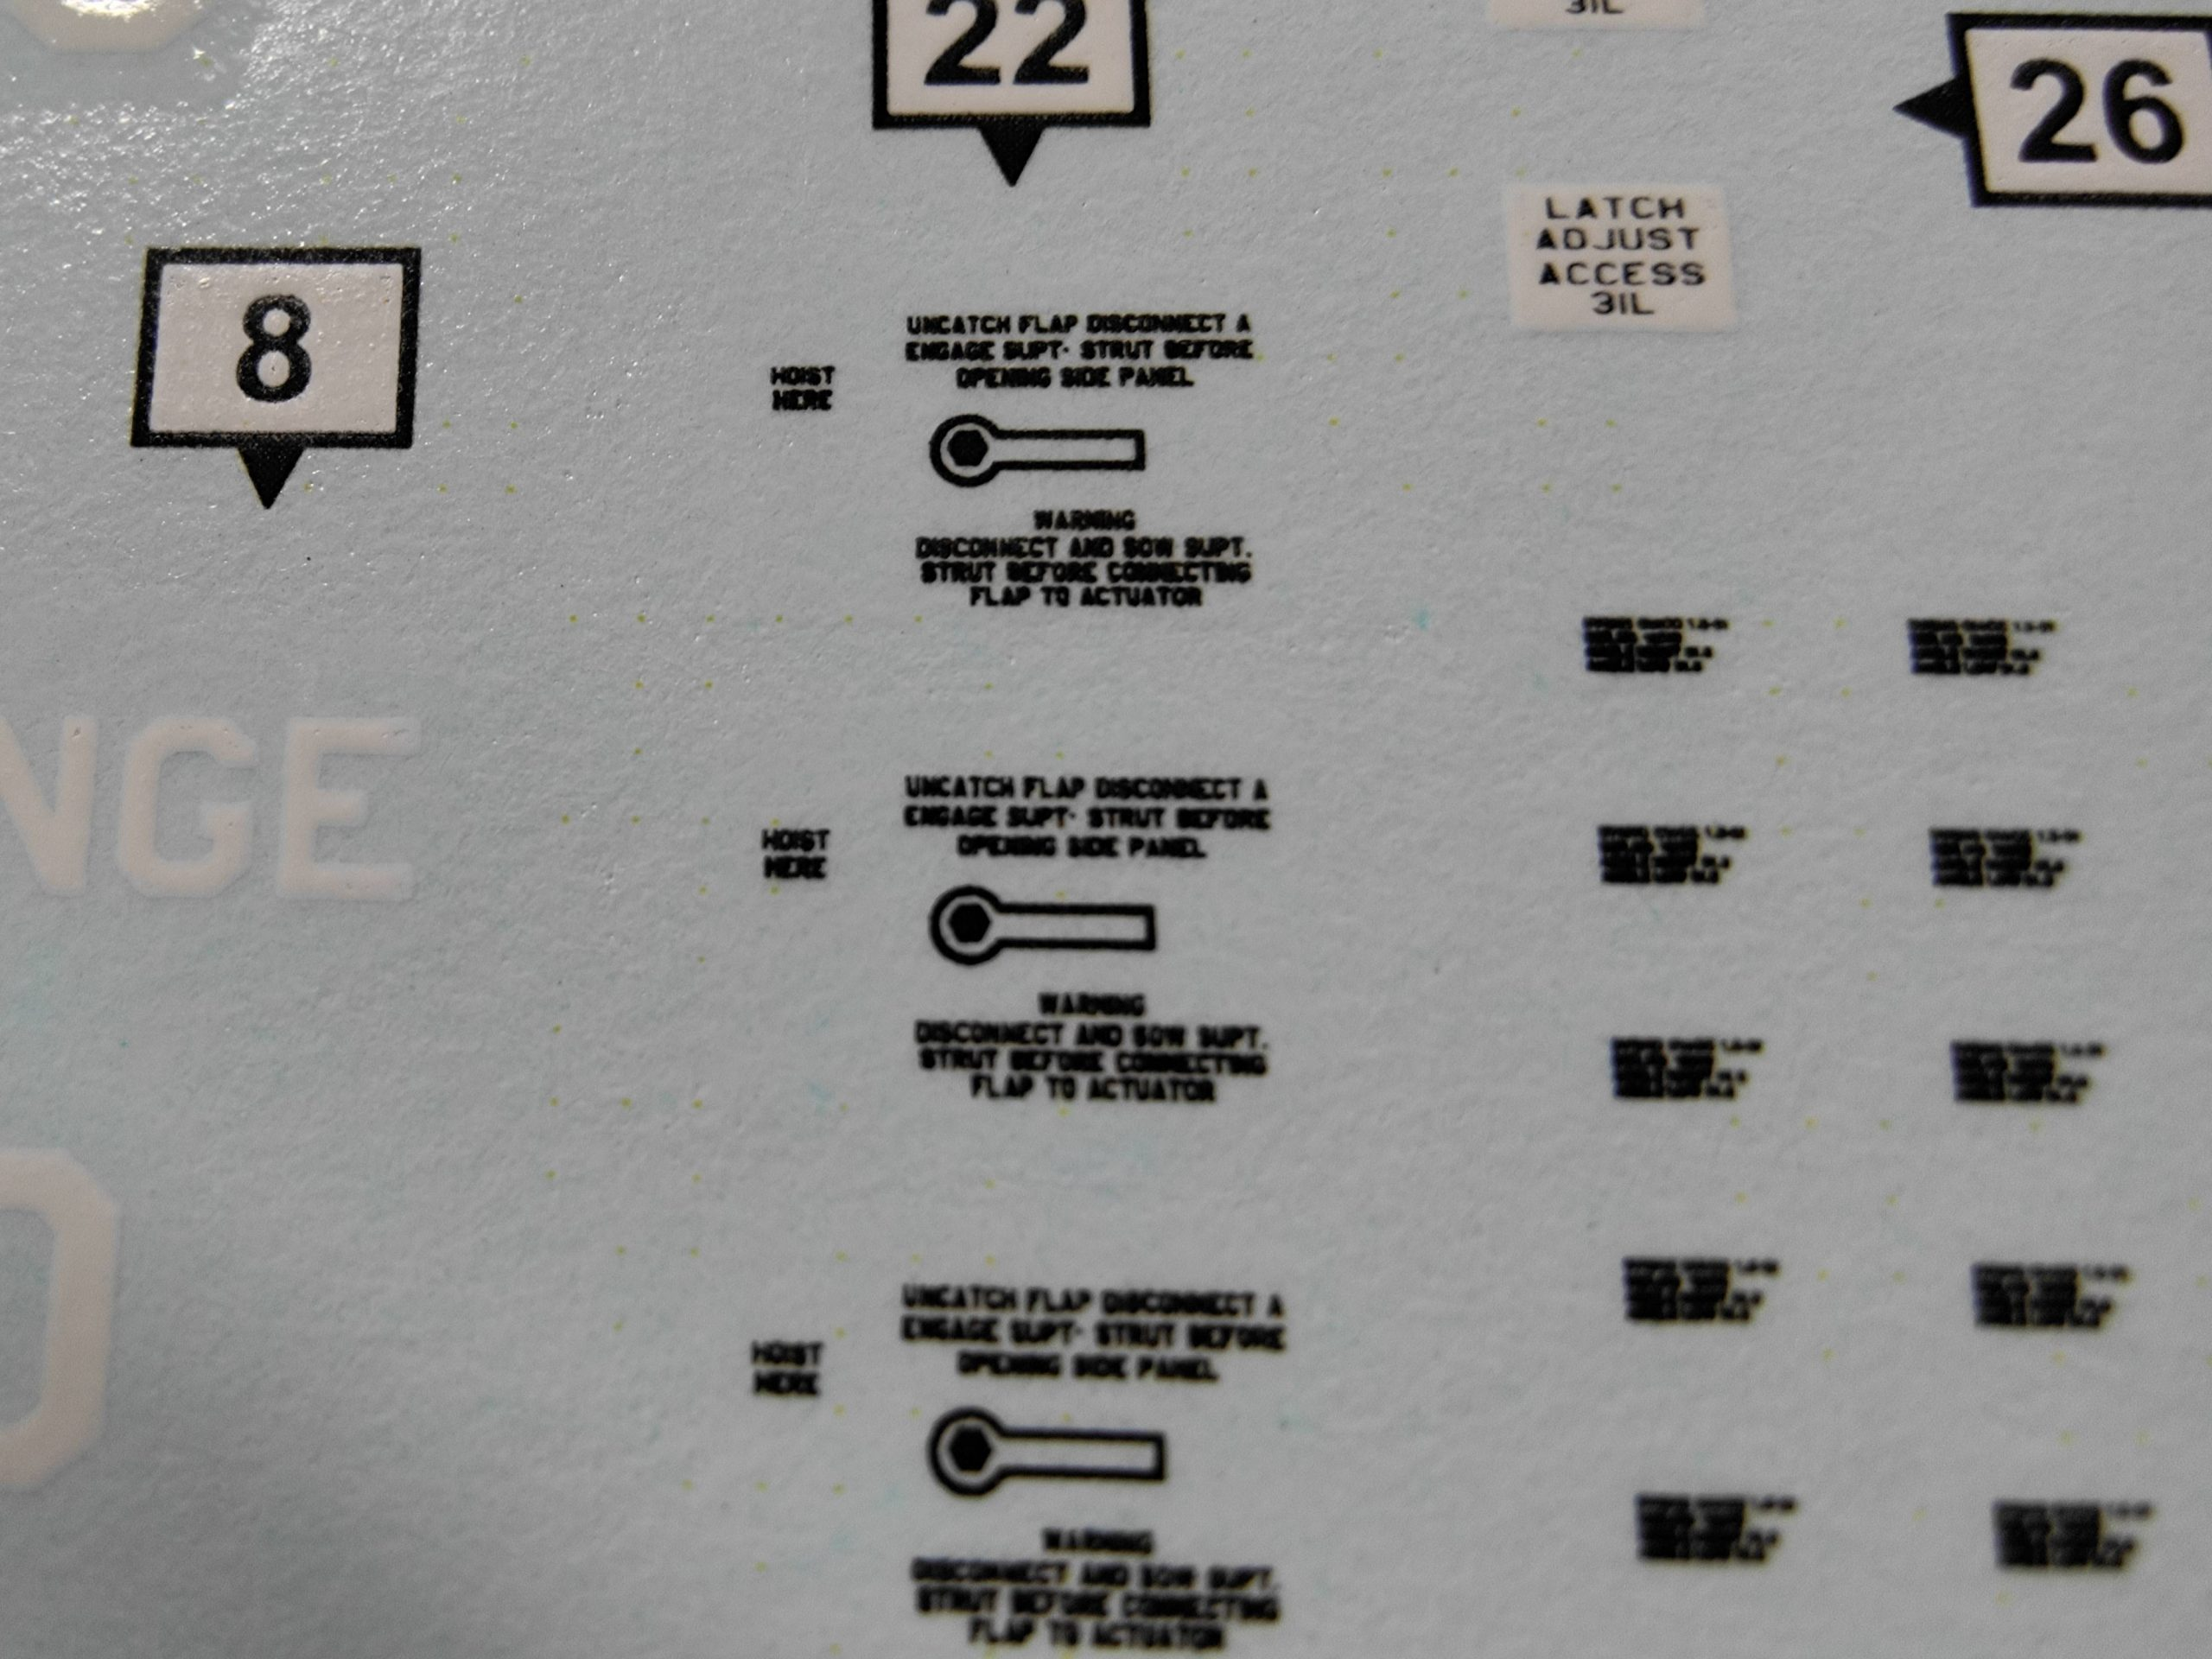 heller_lockheed_warn05-scaled Lockheed EC-121 Warning Star von Heller in 1:72